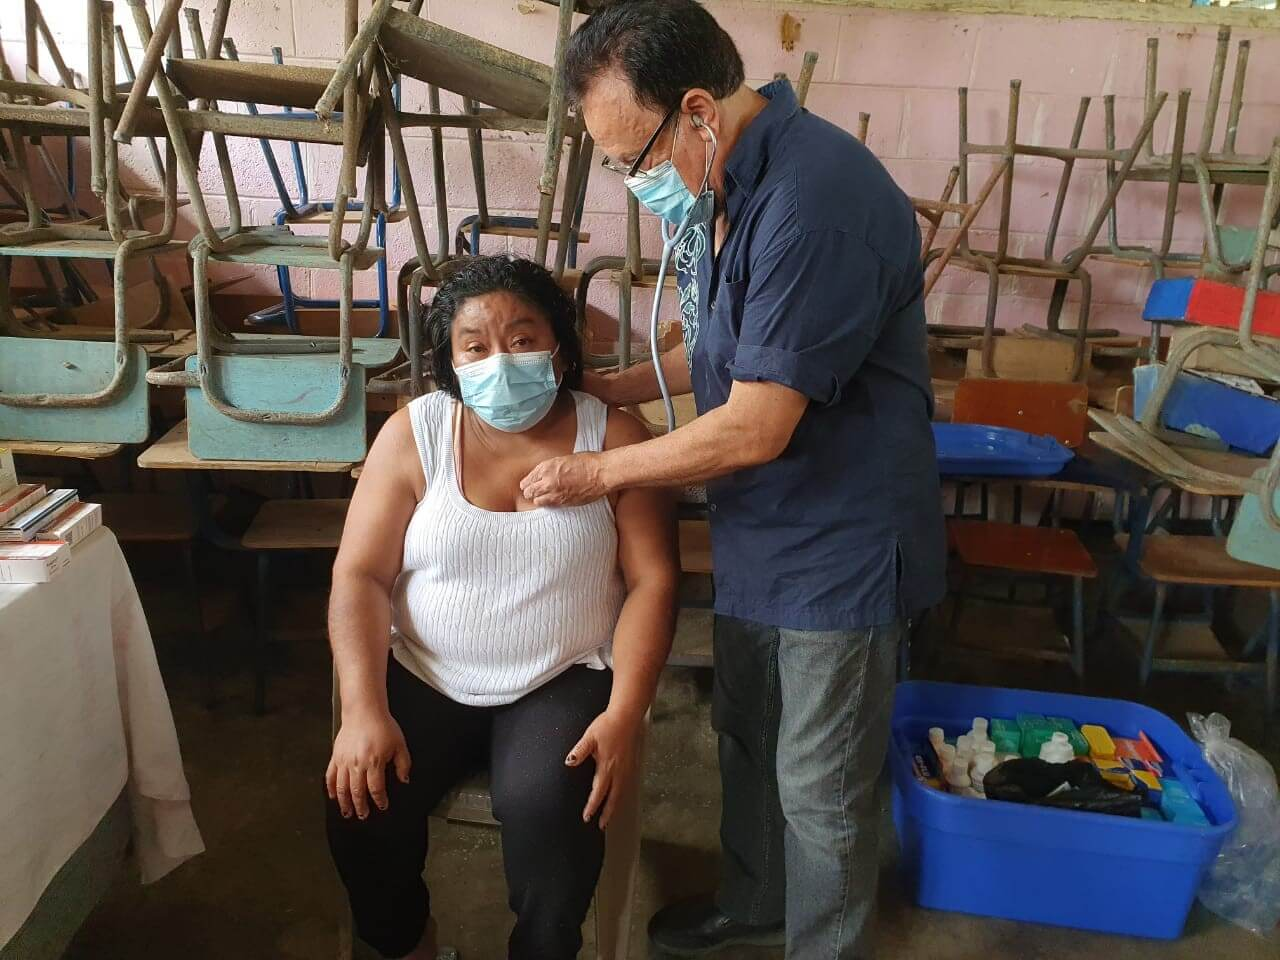 World's Leading Banana Company Organizes Donations to Central America Clinic